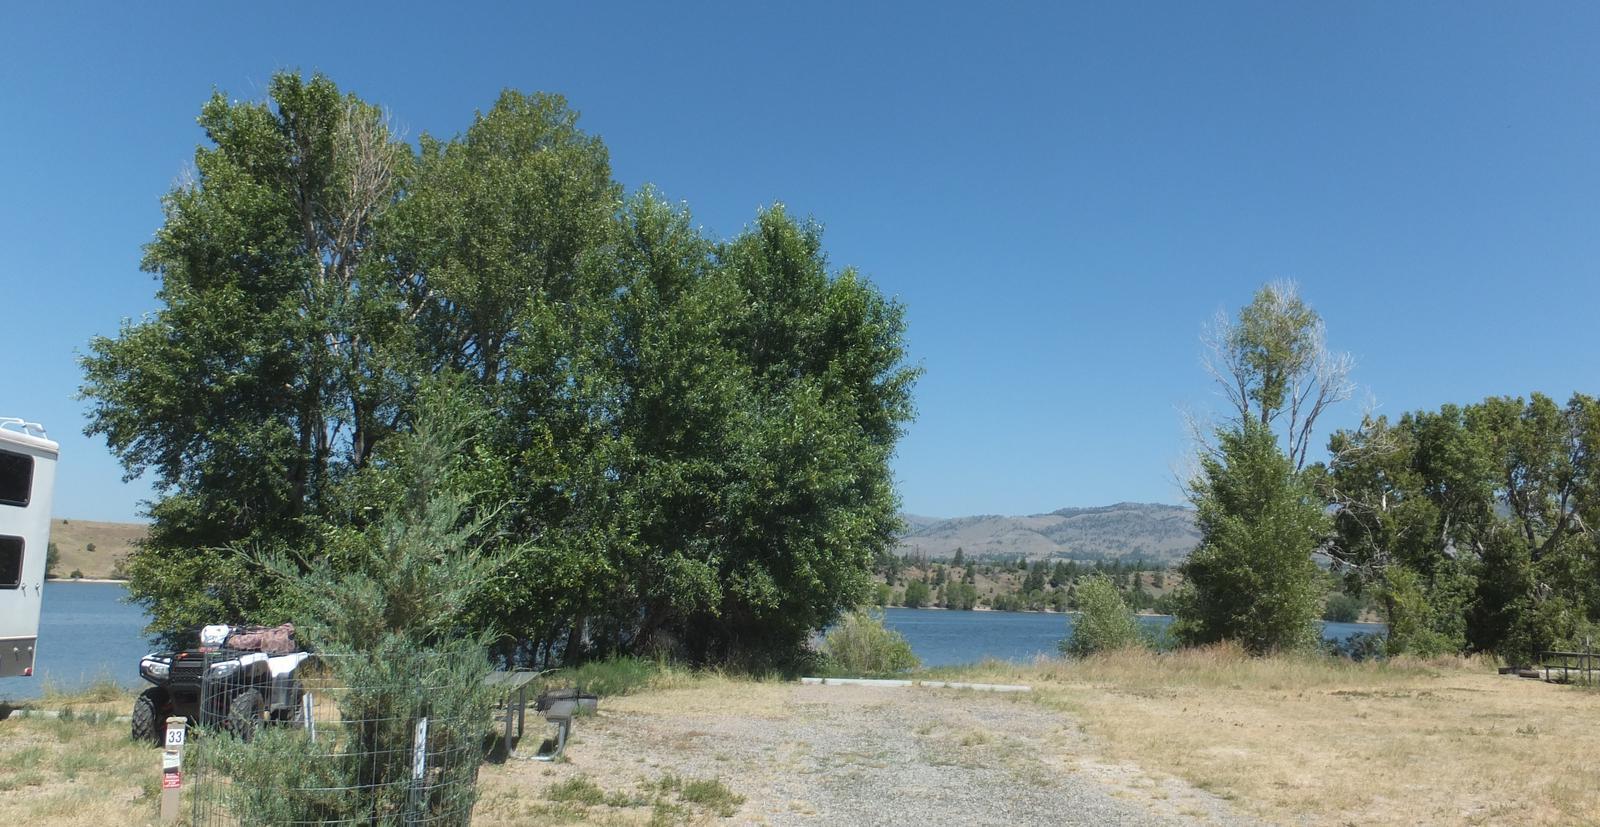 Hellgate Campground - Campsite 33